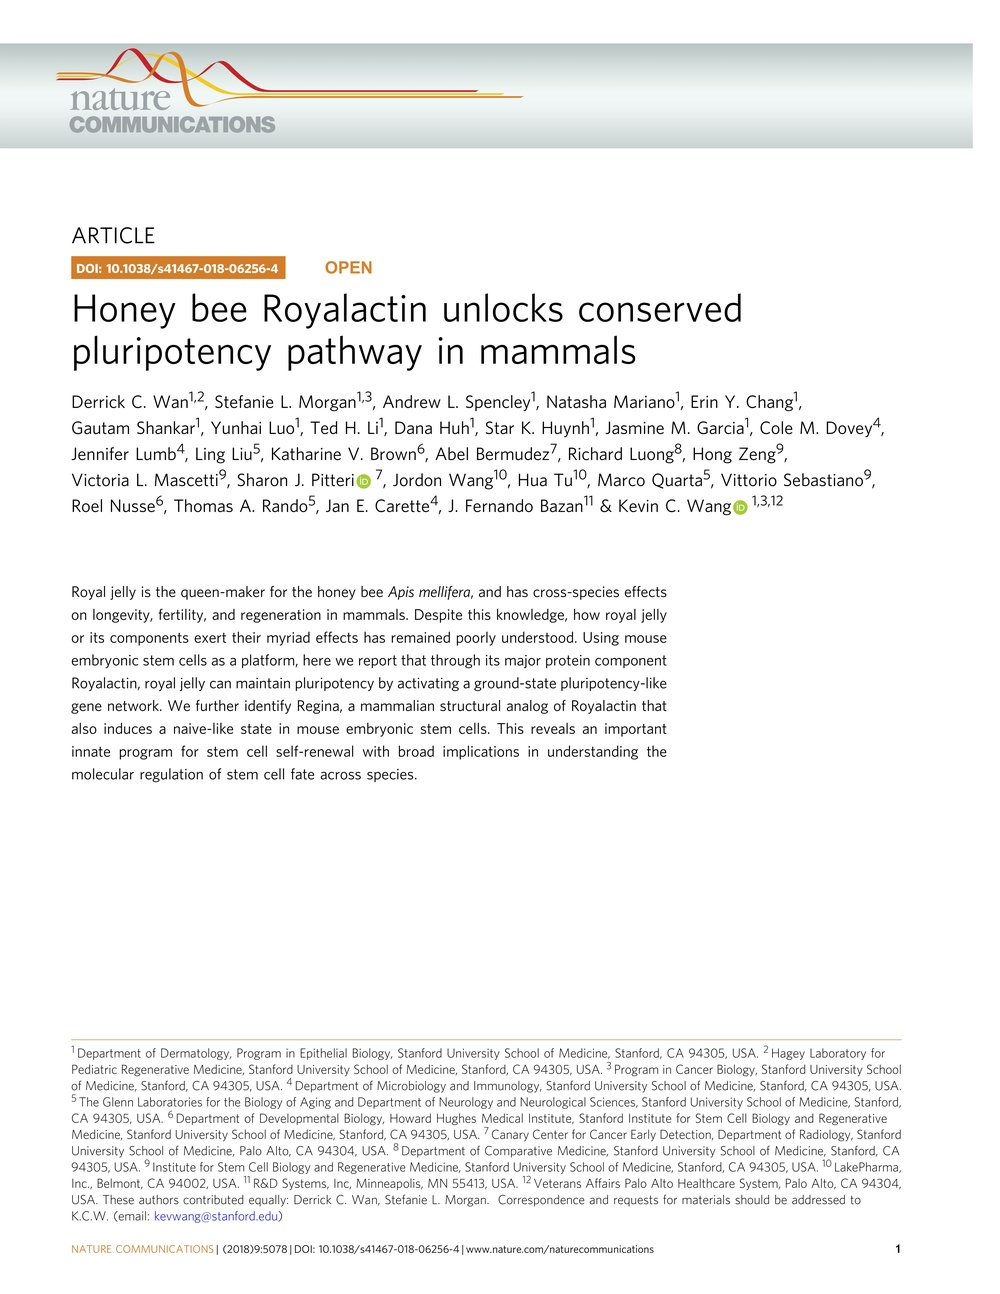 Honey bee Royalactin unlocks conserved pluripotency pathway in mammals.jpg